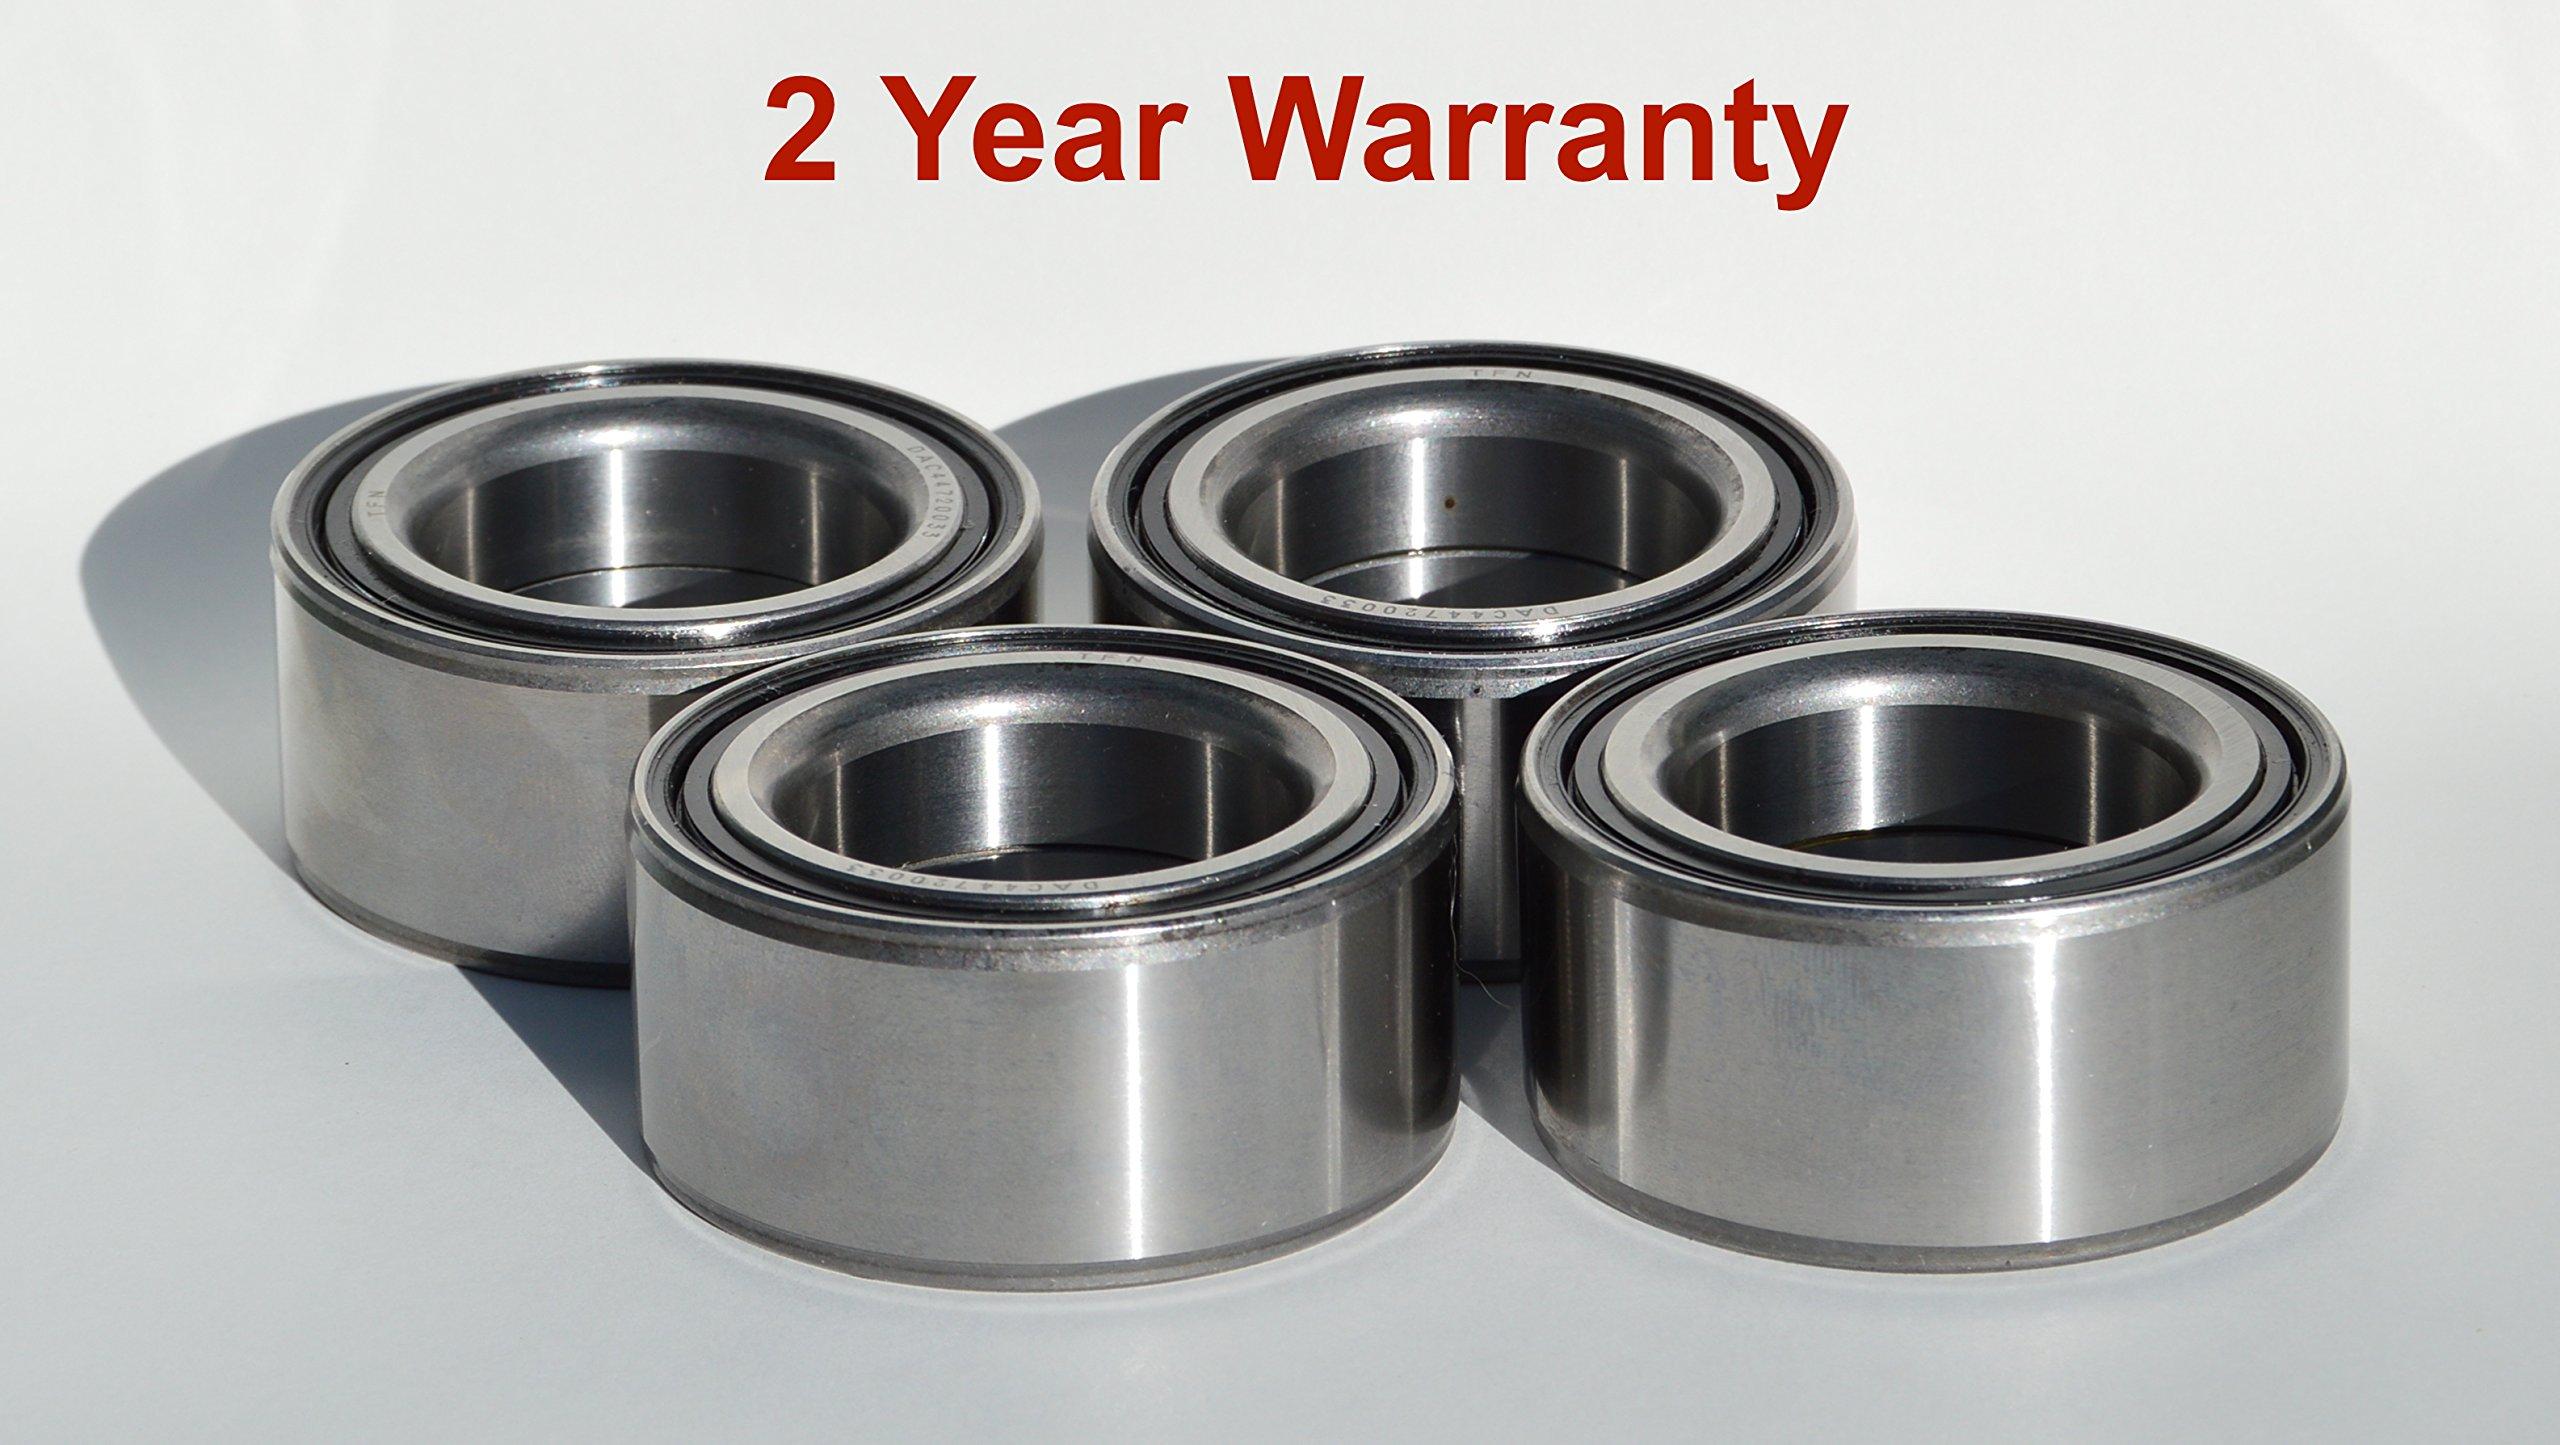 Polaris RZR XP 4 900 1000 Scrambler 850 Front & Rear Wheel Bearings Quantity 4